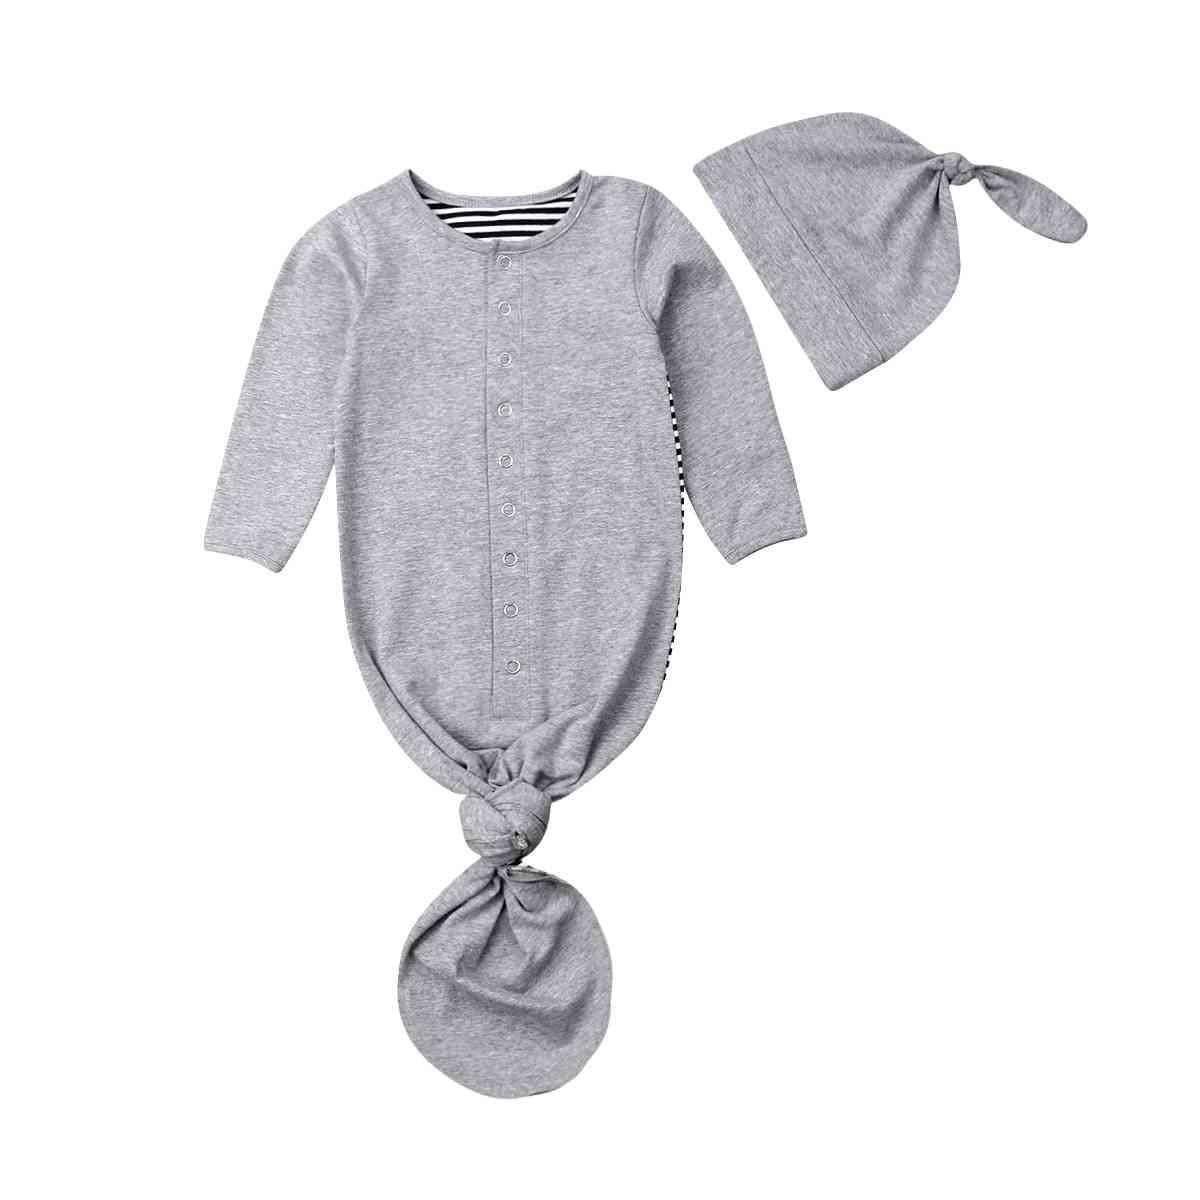 Newborn Blanket, Swaddle Stroller Wrap Sleeping Bag